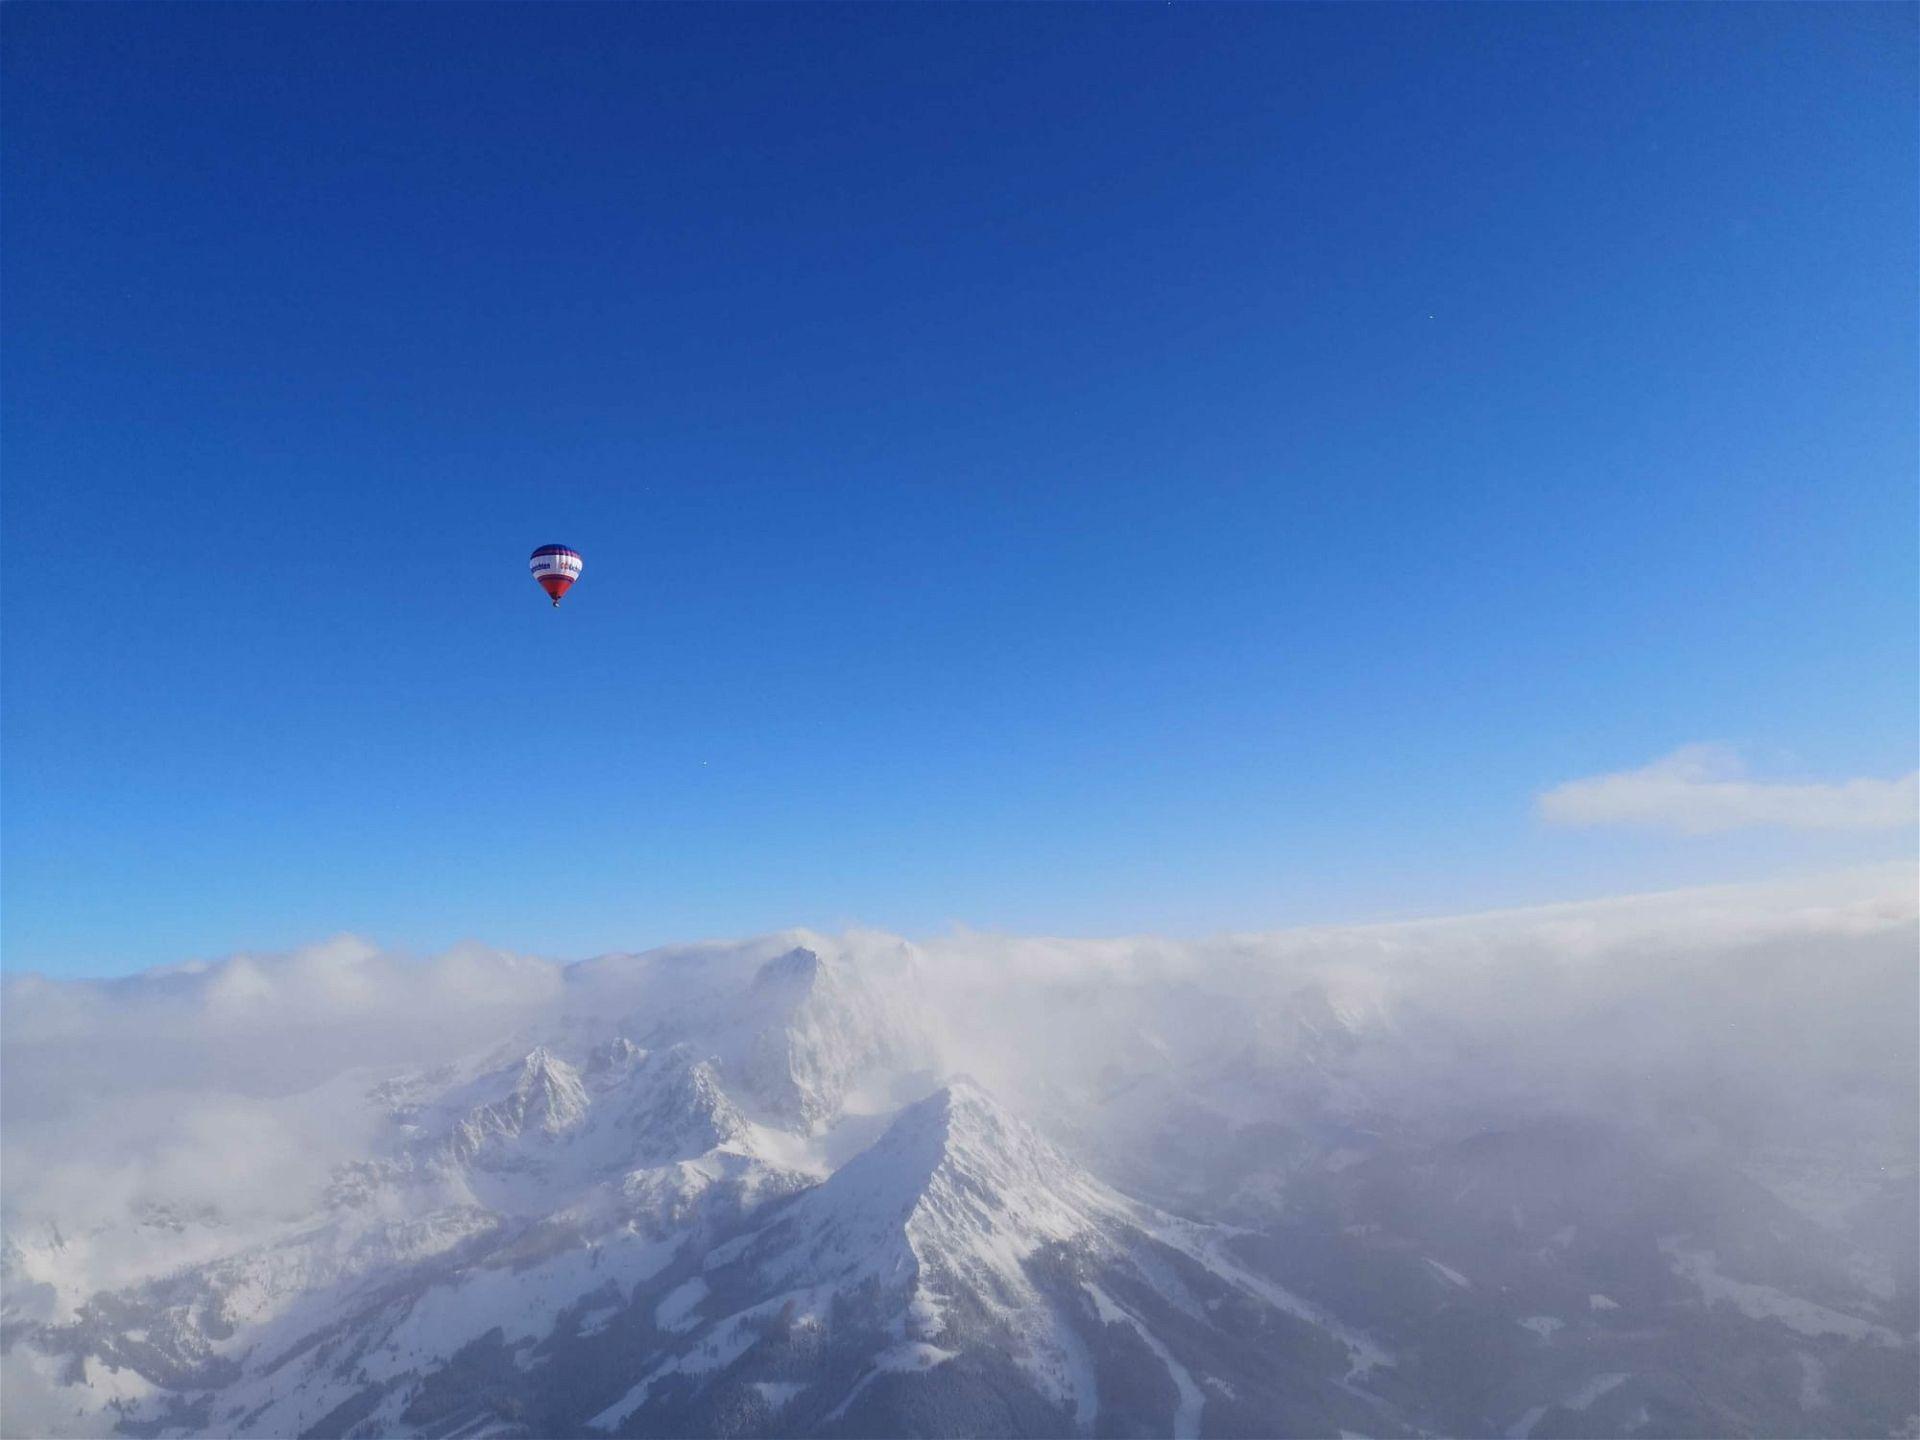 Heißluftballon Fahren Filzmoos